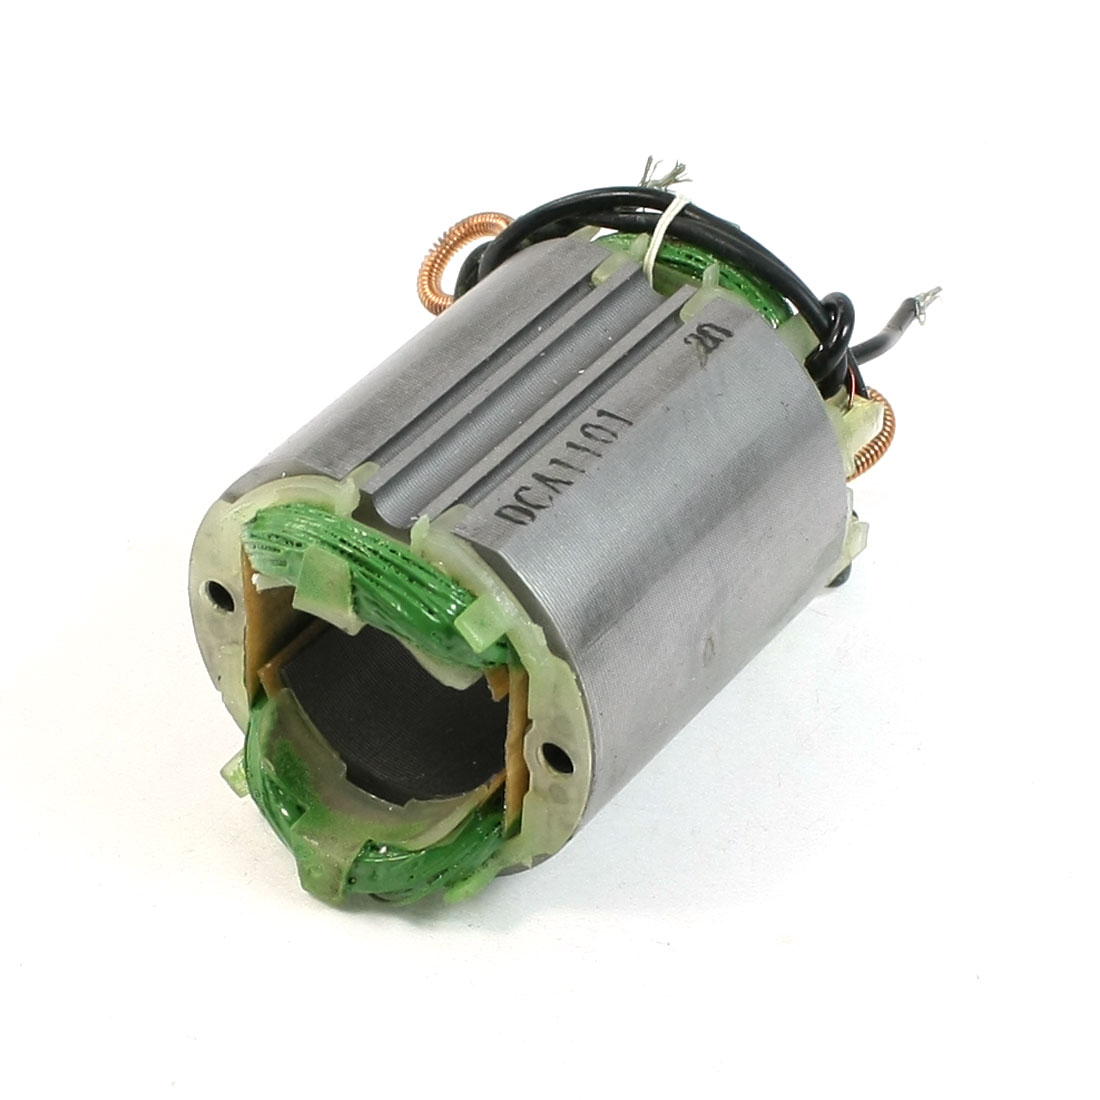 Copper 33mm Rotor Core Motor Stator AC 220V for Makita 9500N Angle Grinder